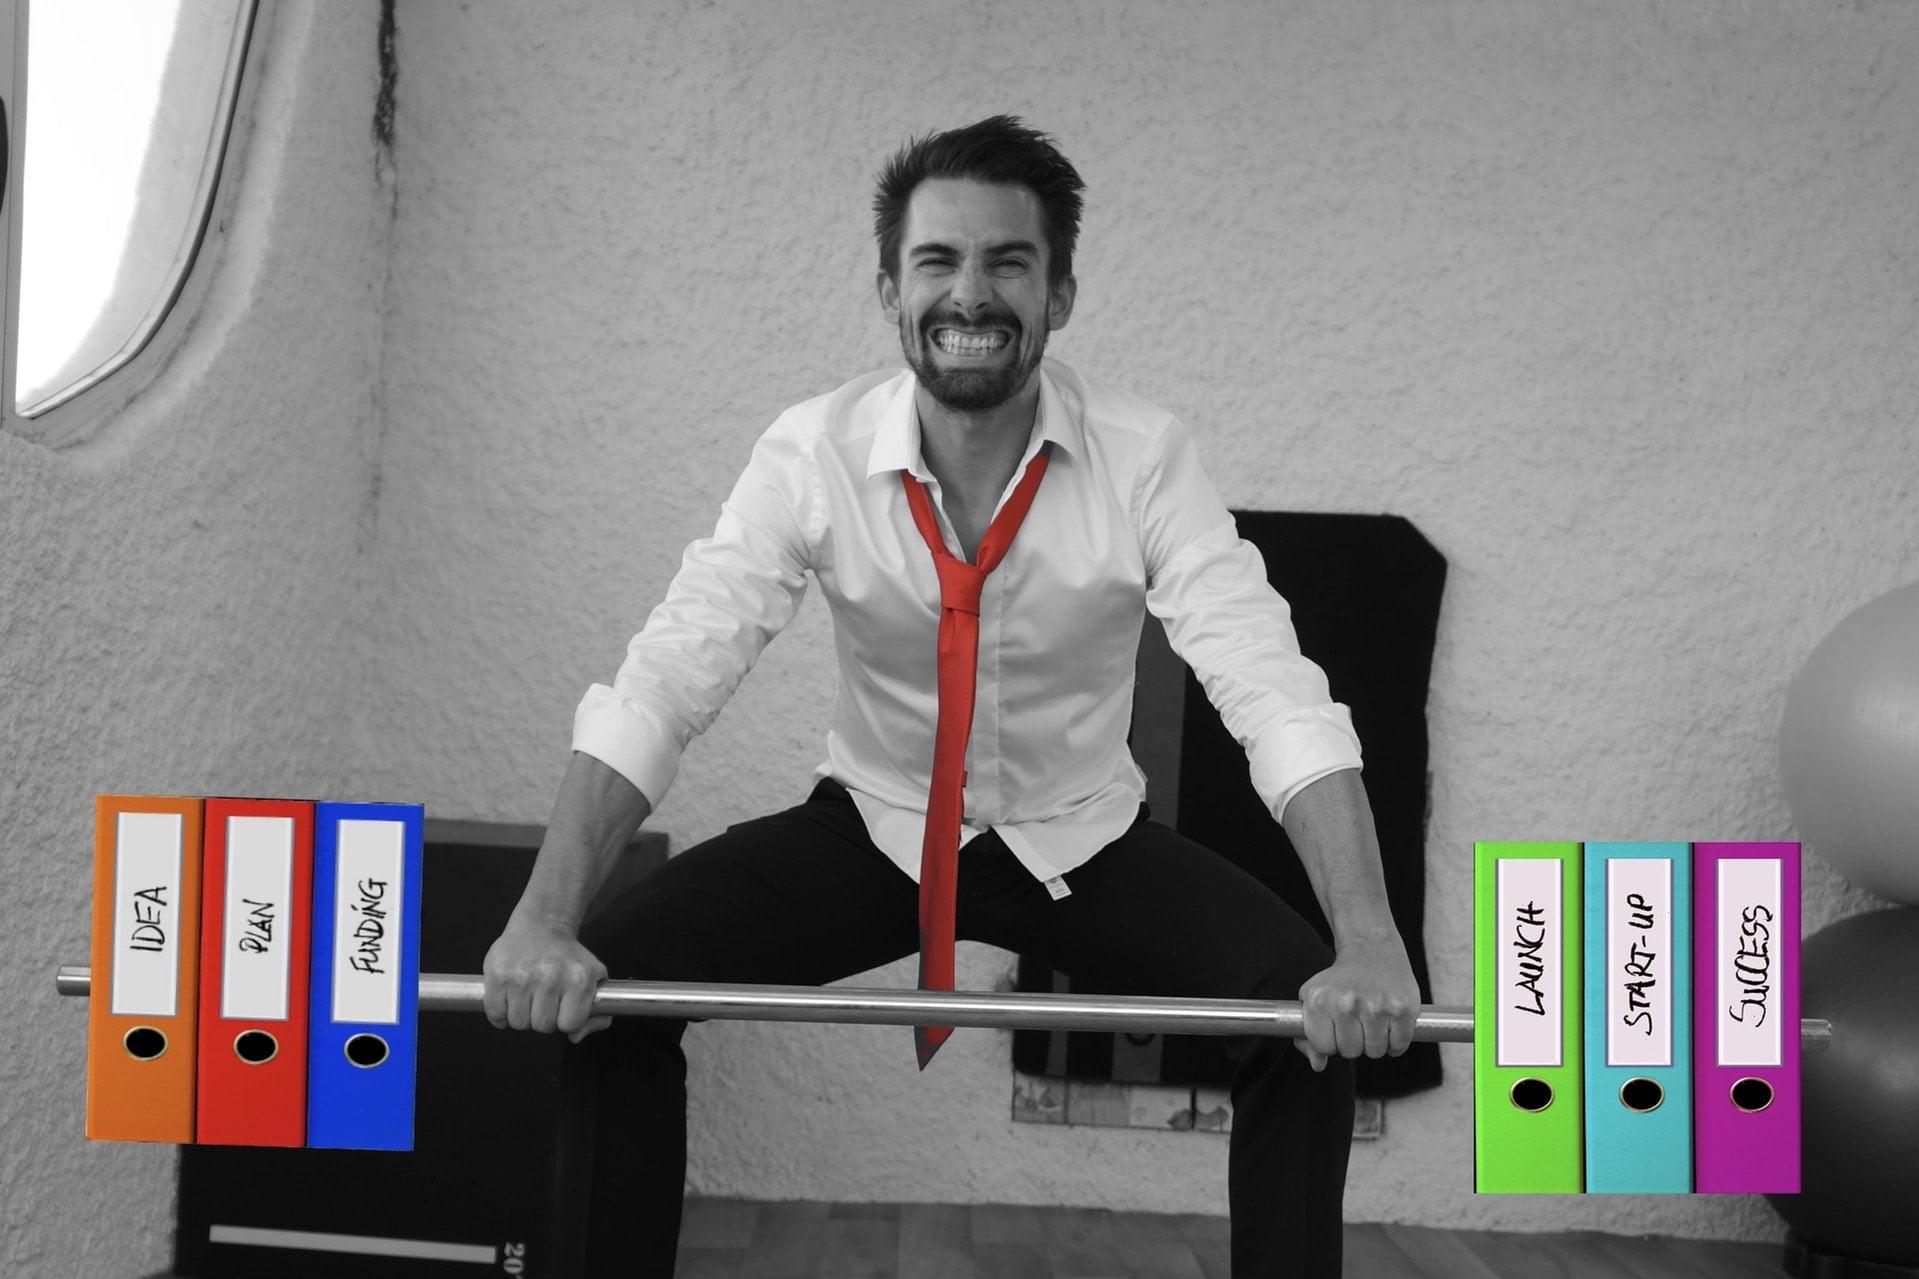 Bruno de La Solution Forme, coach sportif en entreprise